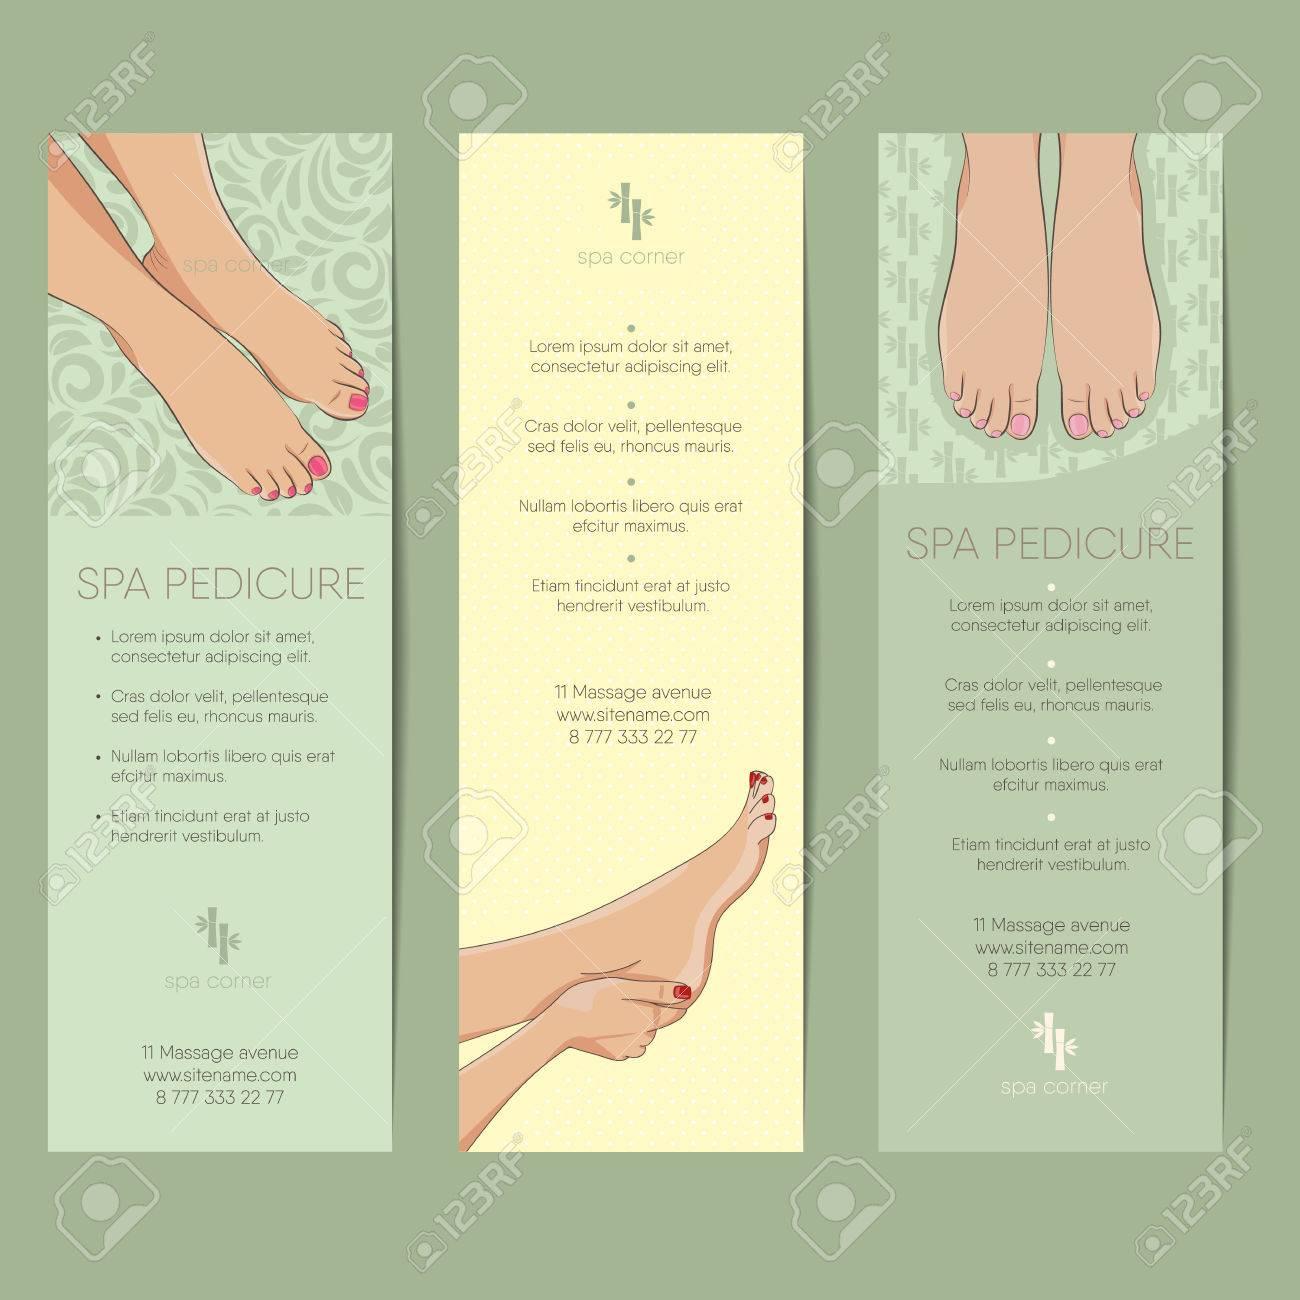 set of vertical banner coupon templates spa procedures pedicure manicure concept